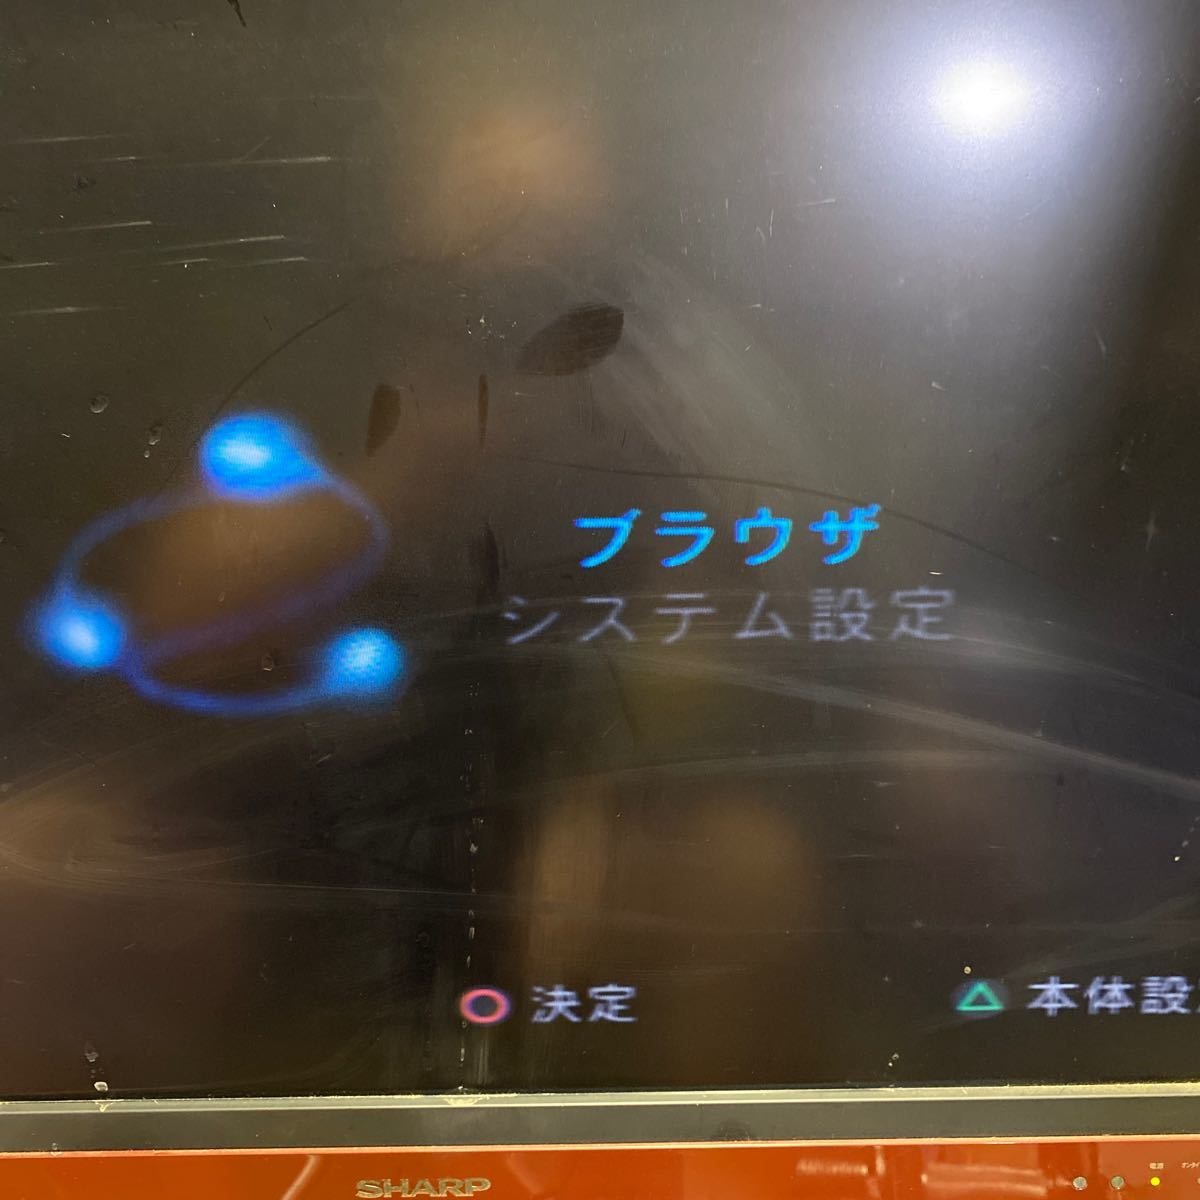 PS2 SONY プレイステーション2 ソニー PlayStation2 SPCH-30000 ブラック